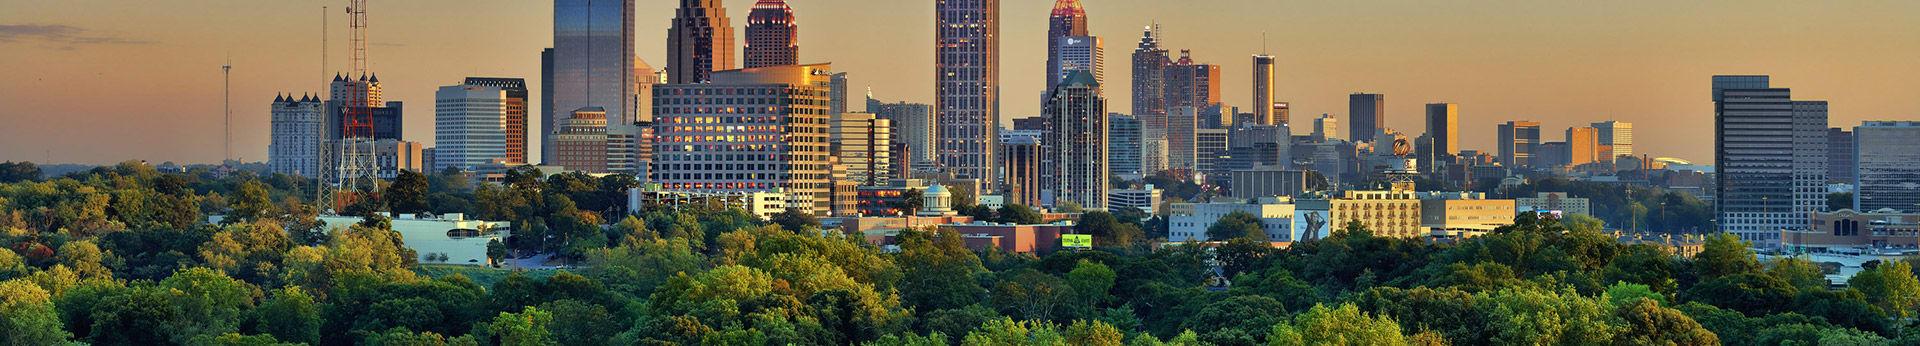 Download Atlanta Maps for Downtown Buckhead Metro Atlanta